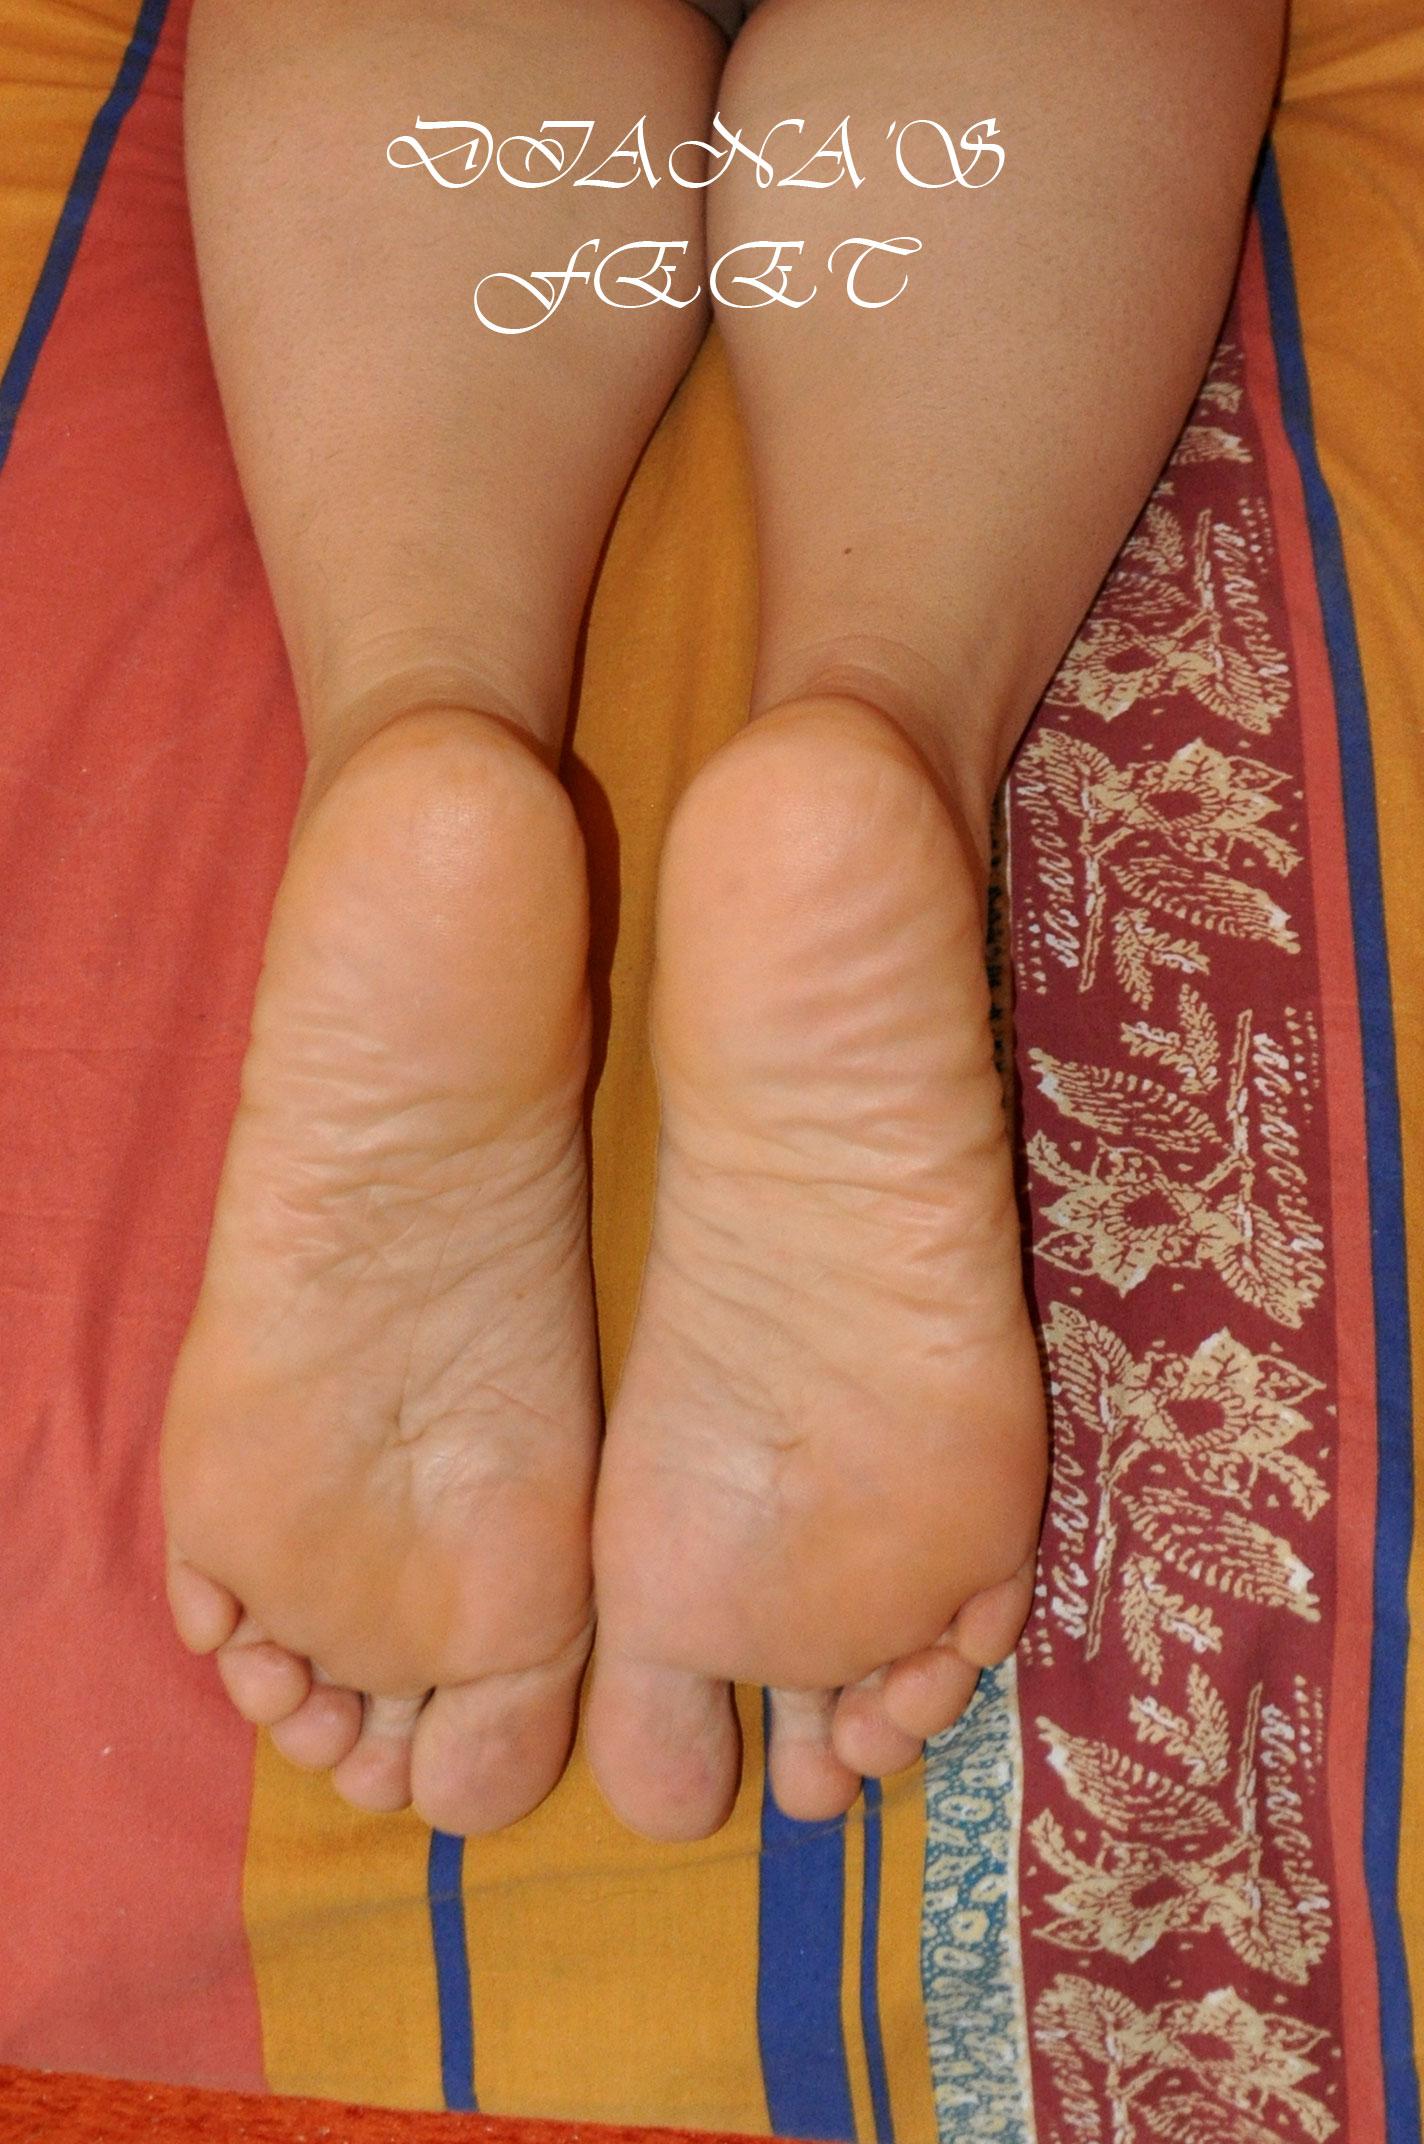 Diana 's feet 171114101801566042